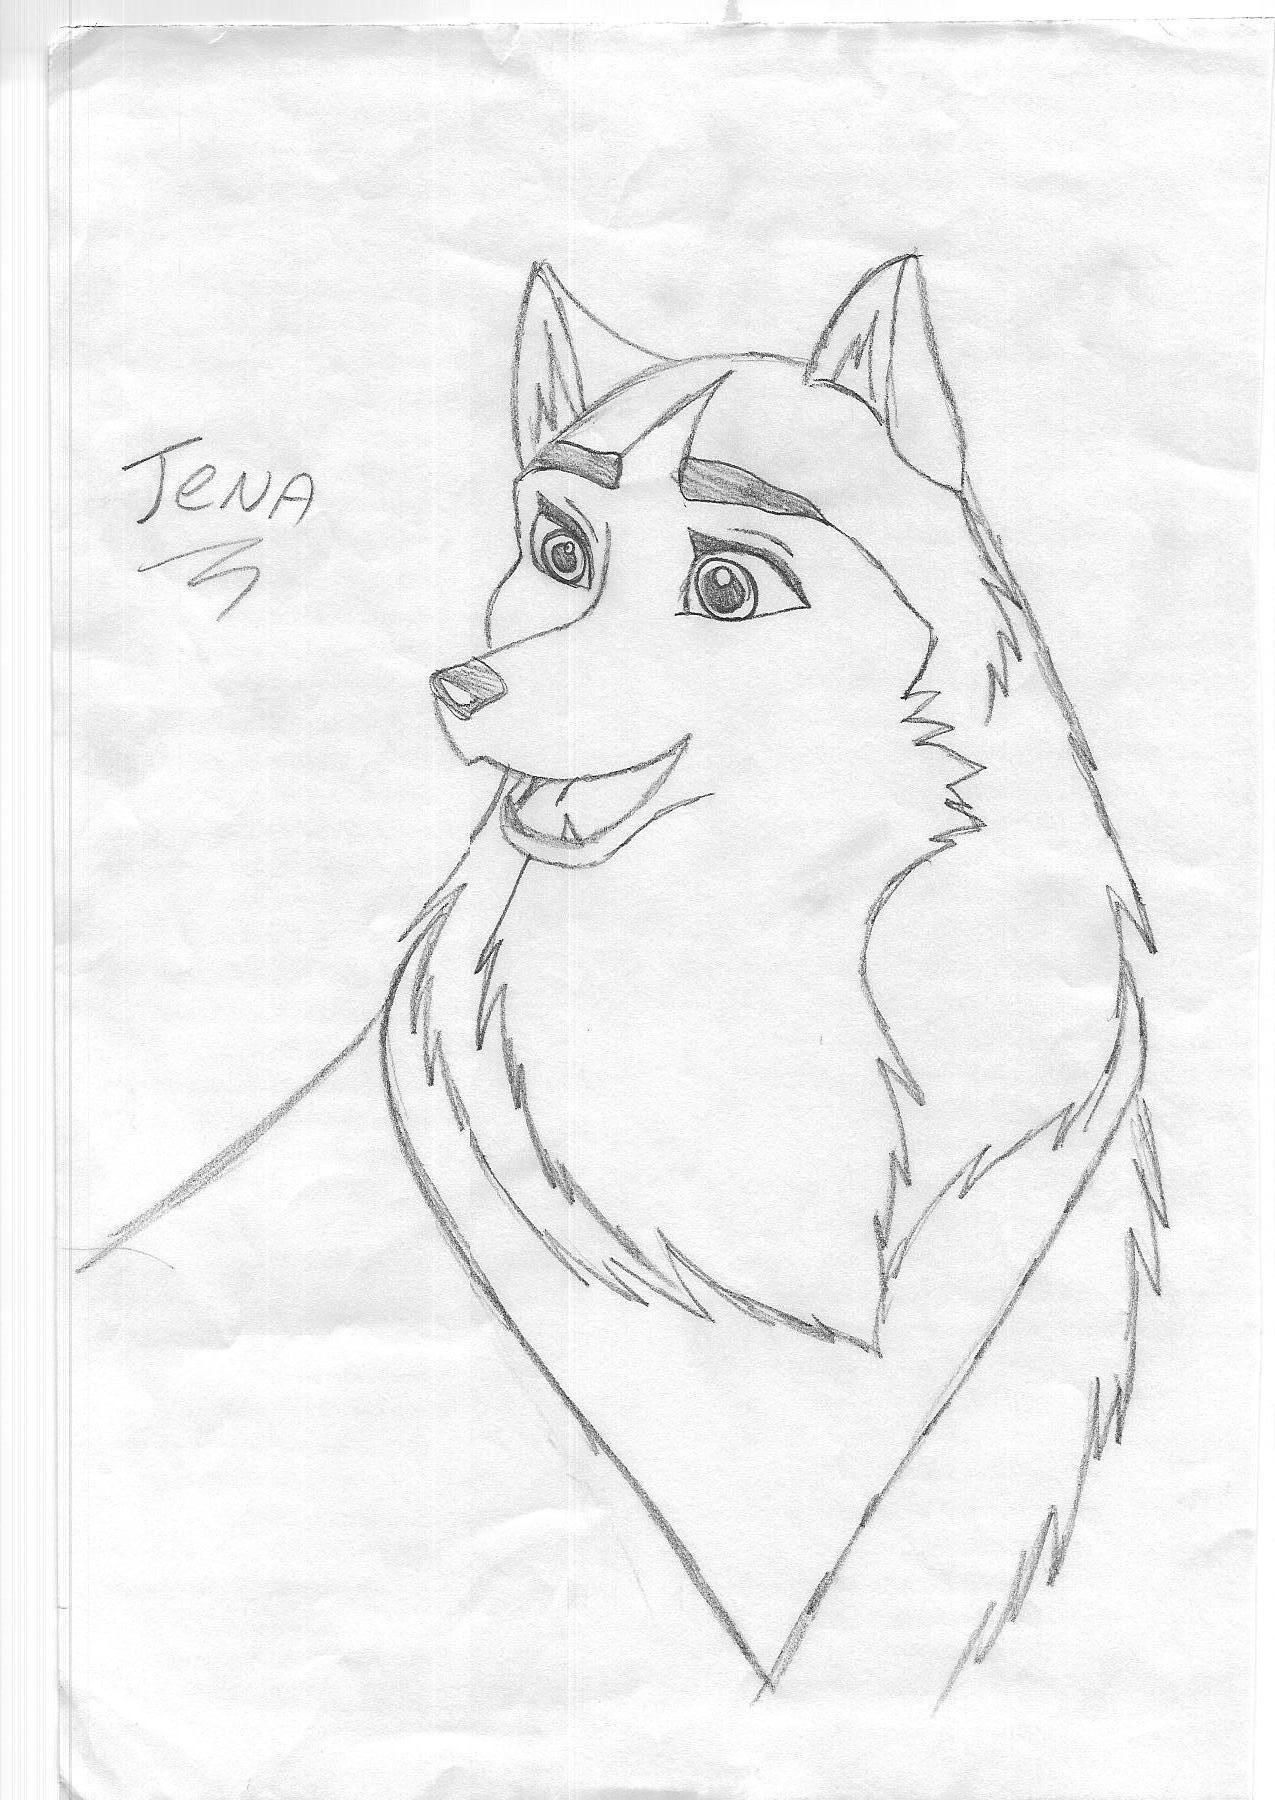 Jena by IceWolfGurl